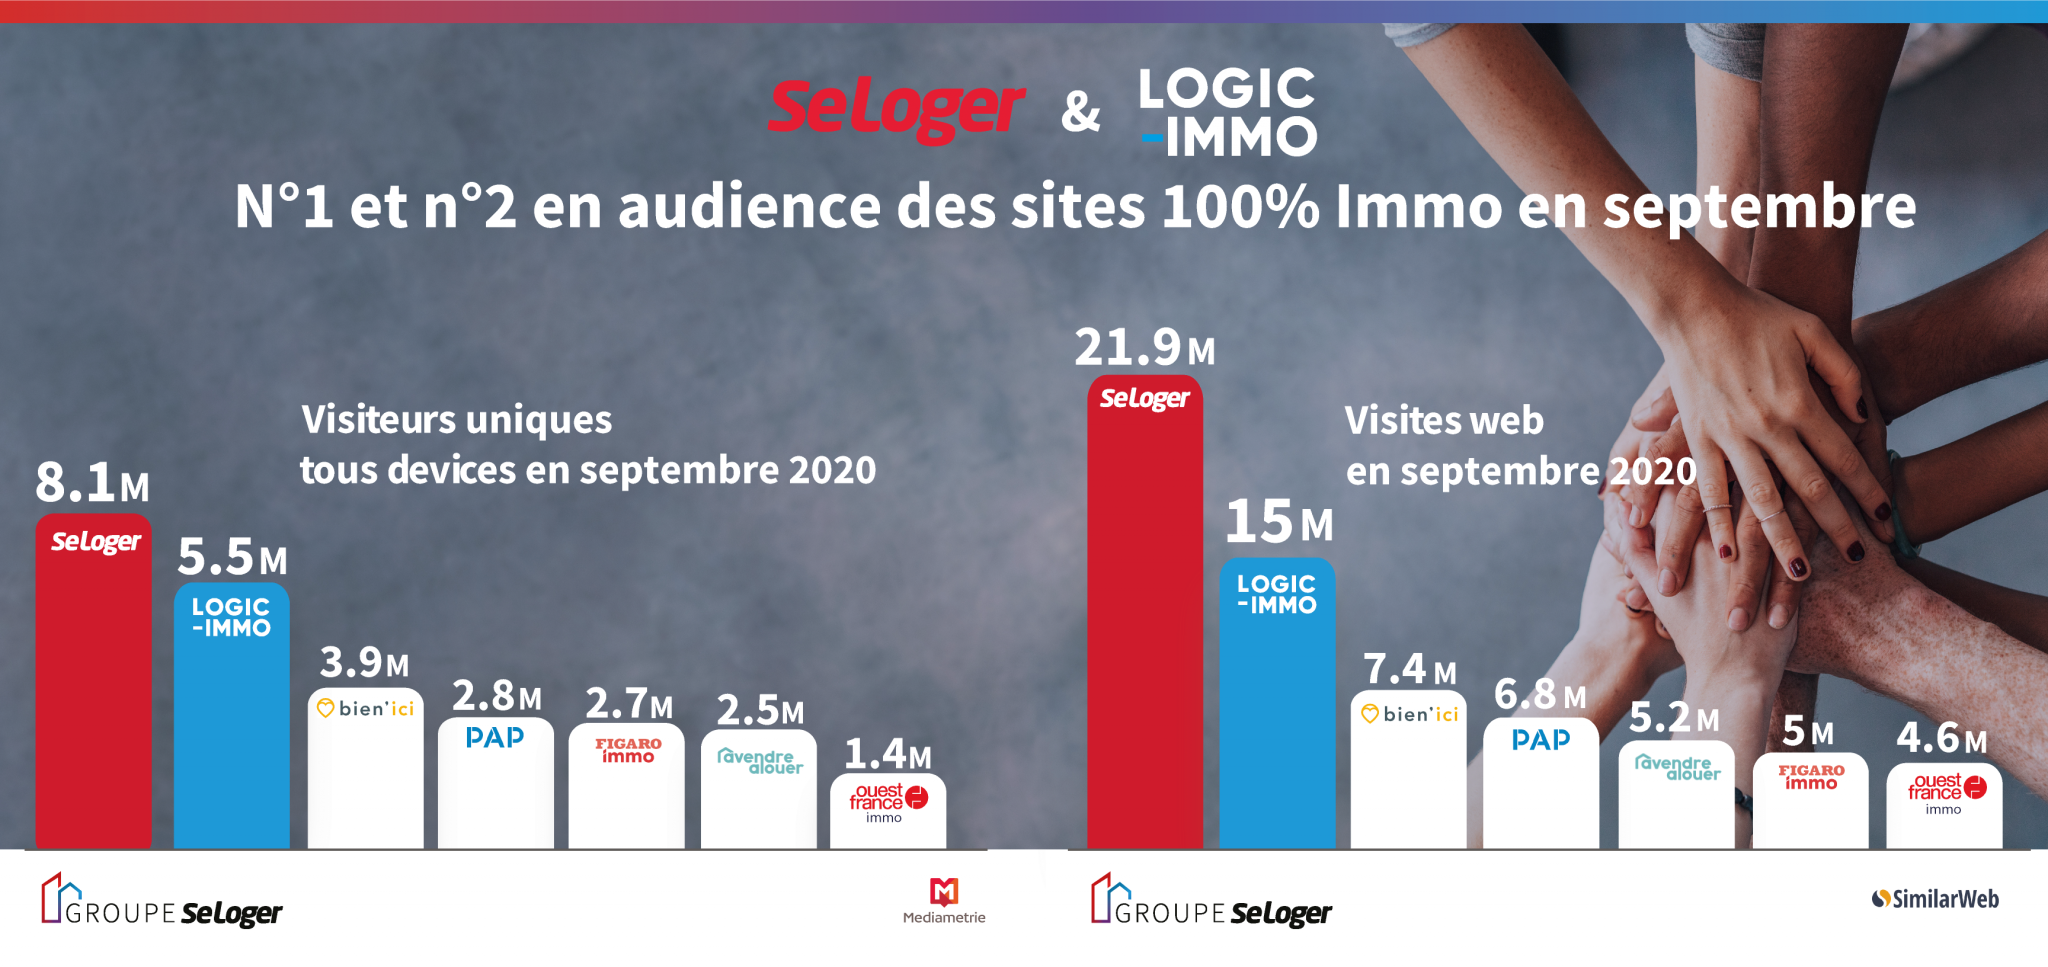 SeLoger et Logic-Immo, n°1 et 2 des sites 100% immo en septembre 2020